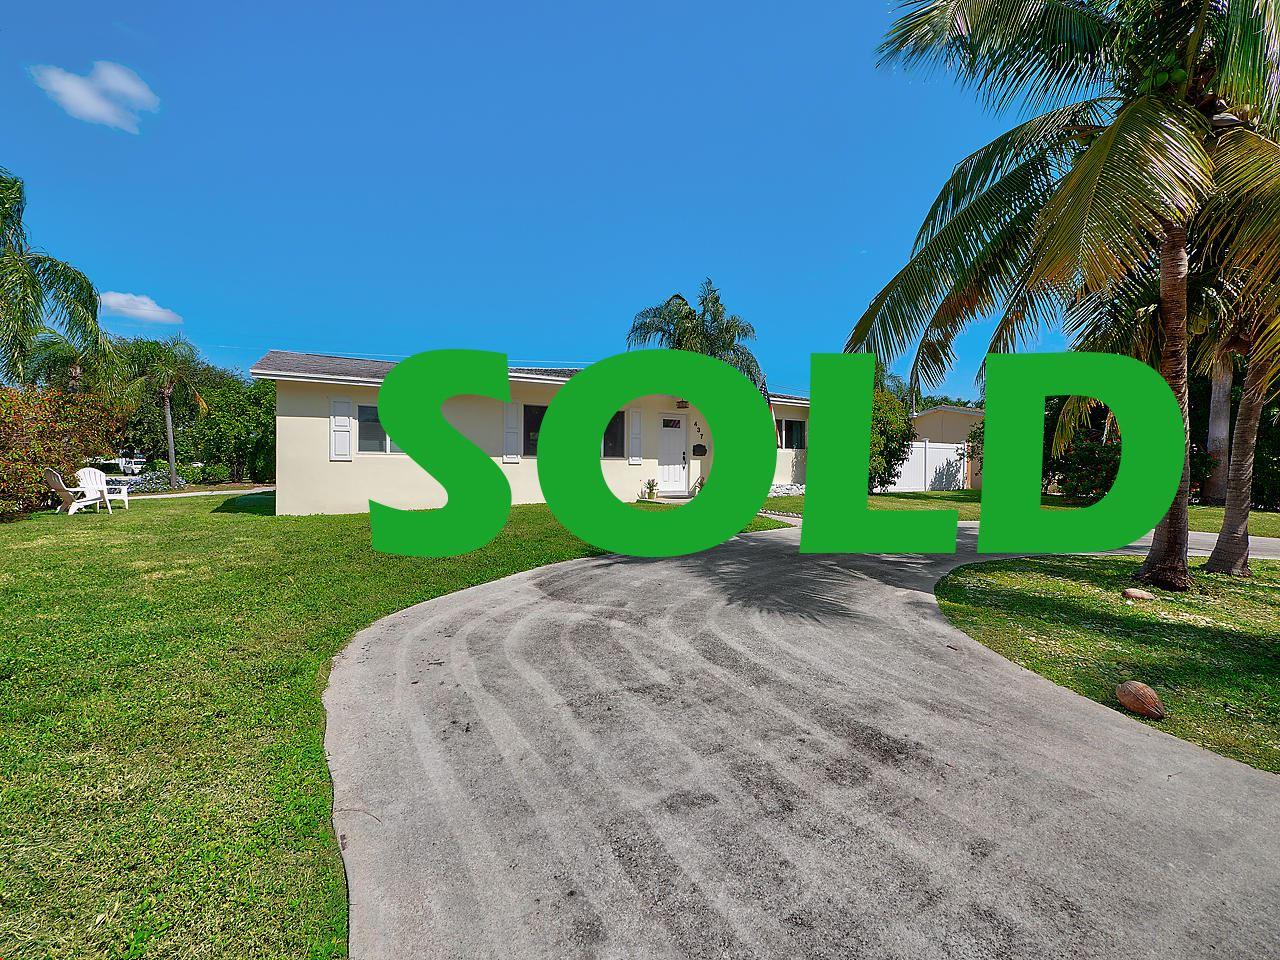 437 Driftwood Road, North Palm Beach, FL 33408 - #: RX-10564765